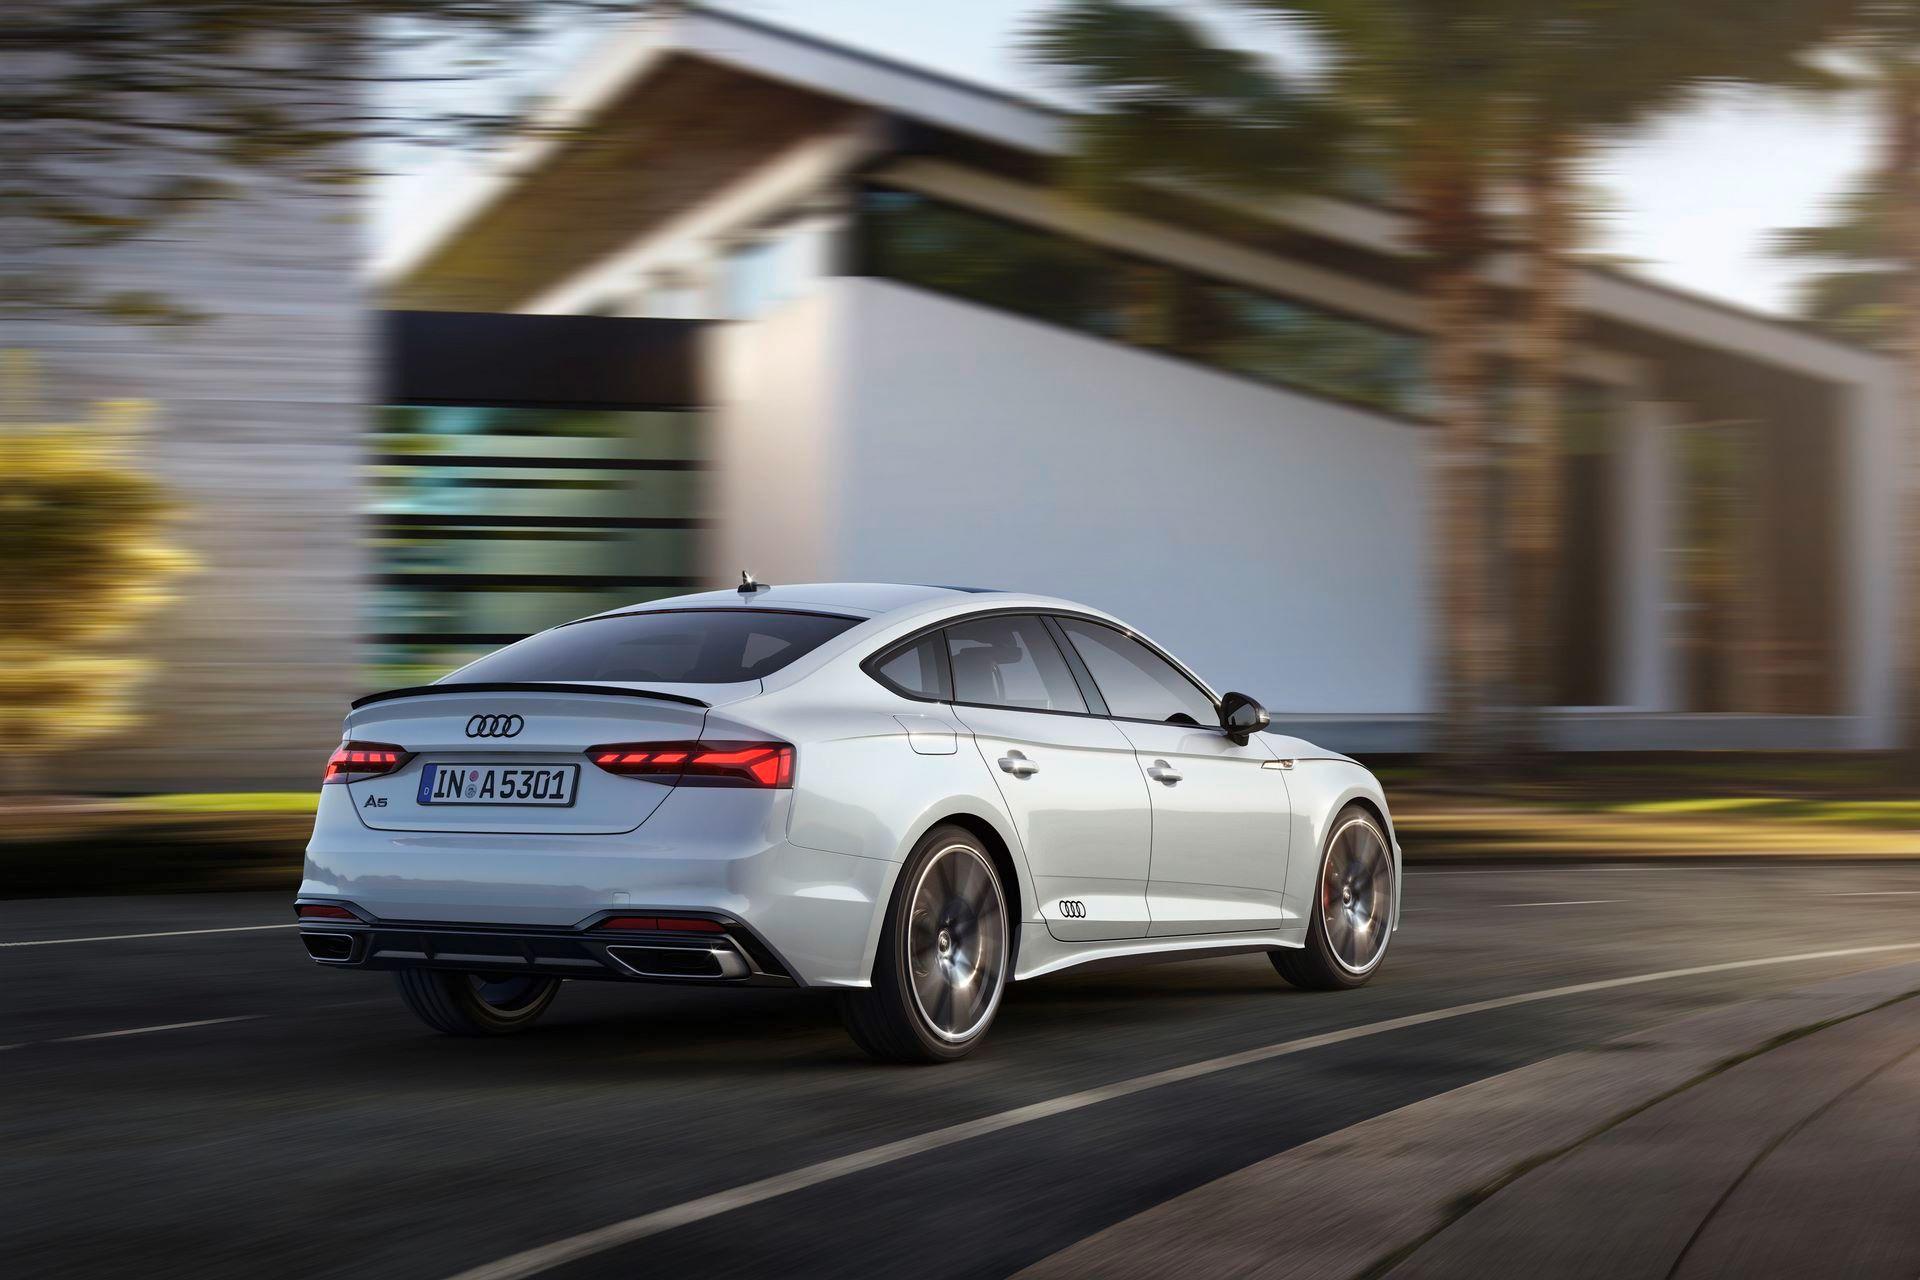 Audi-A4-A5-Q7-Q8-Competition-And-Competition-Plus-Trims-69